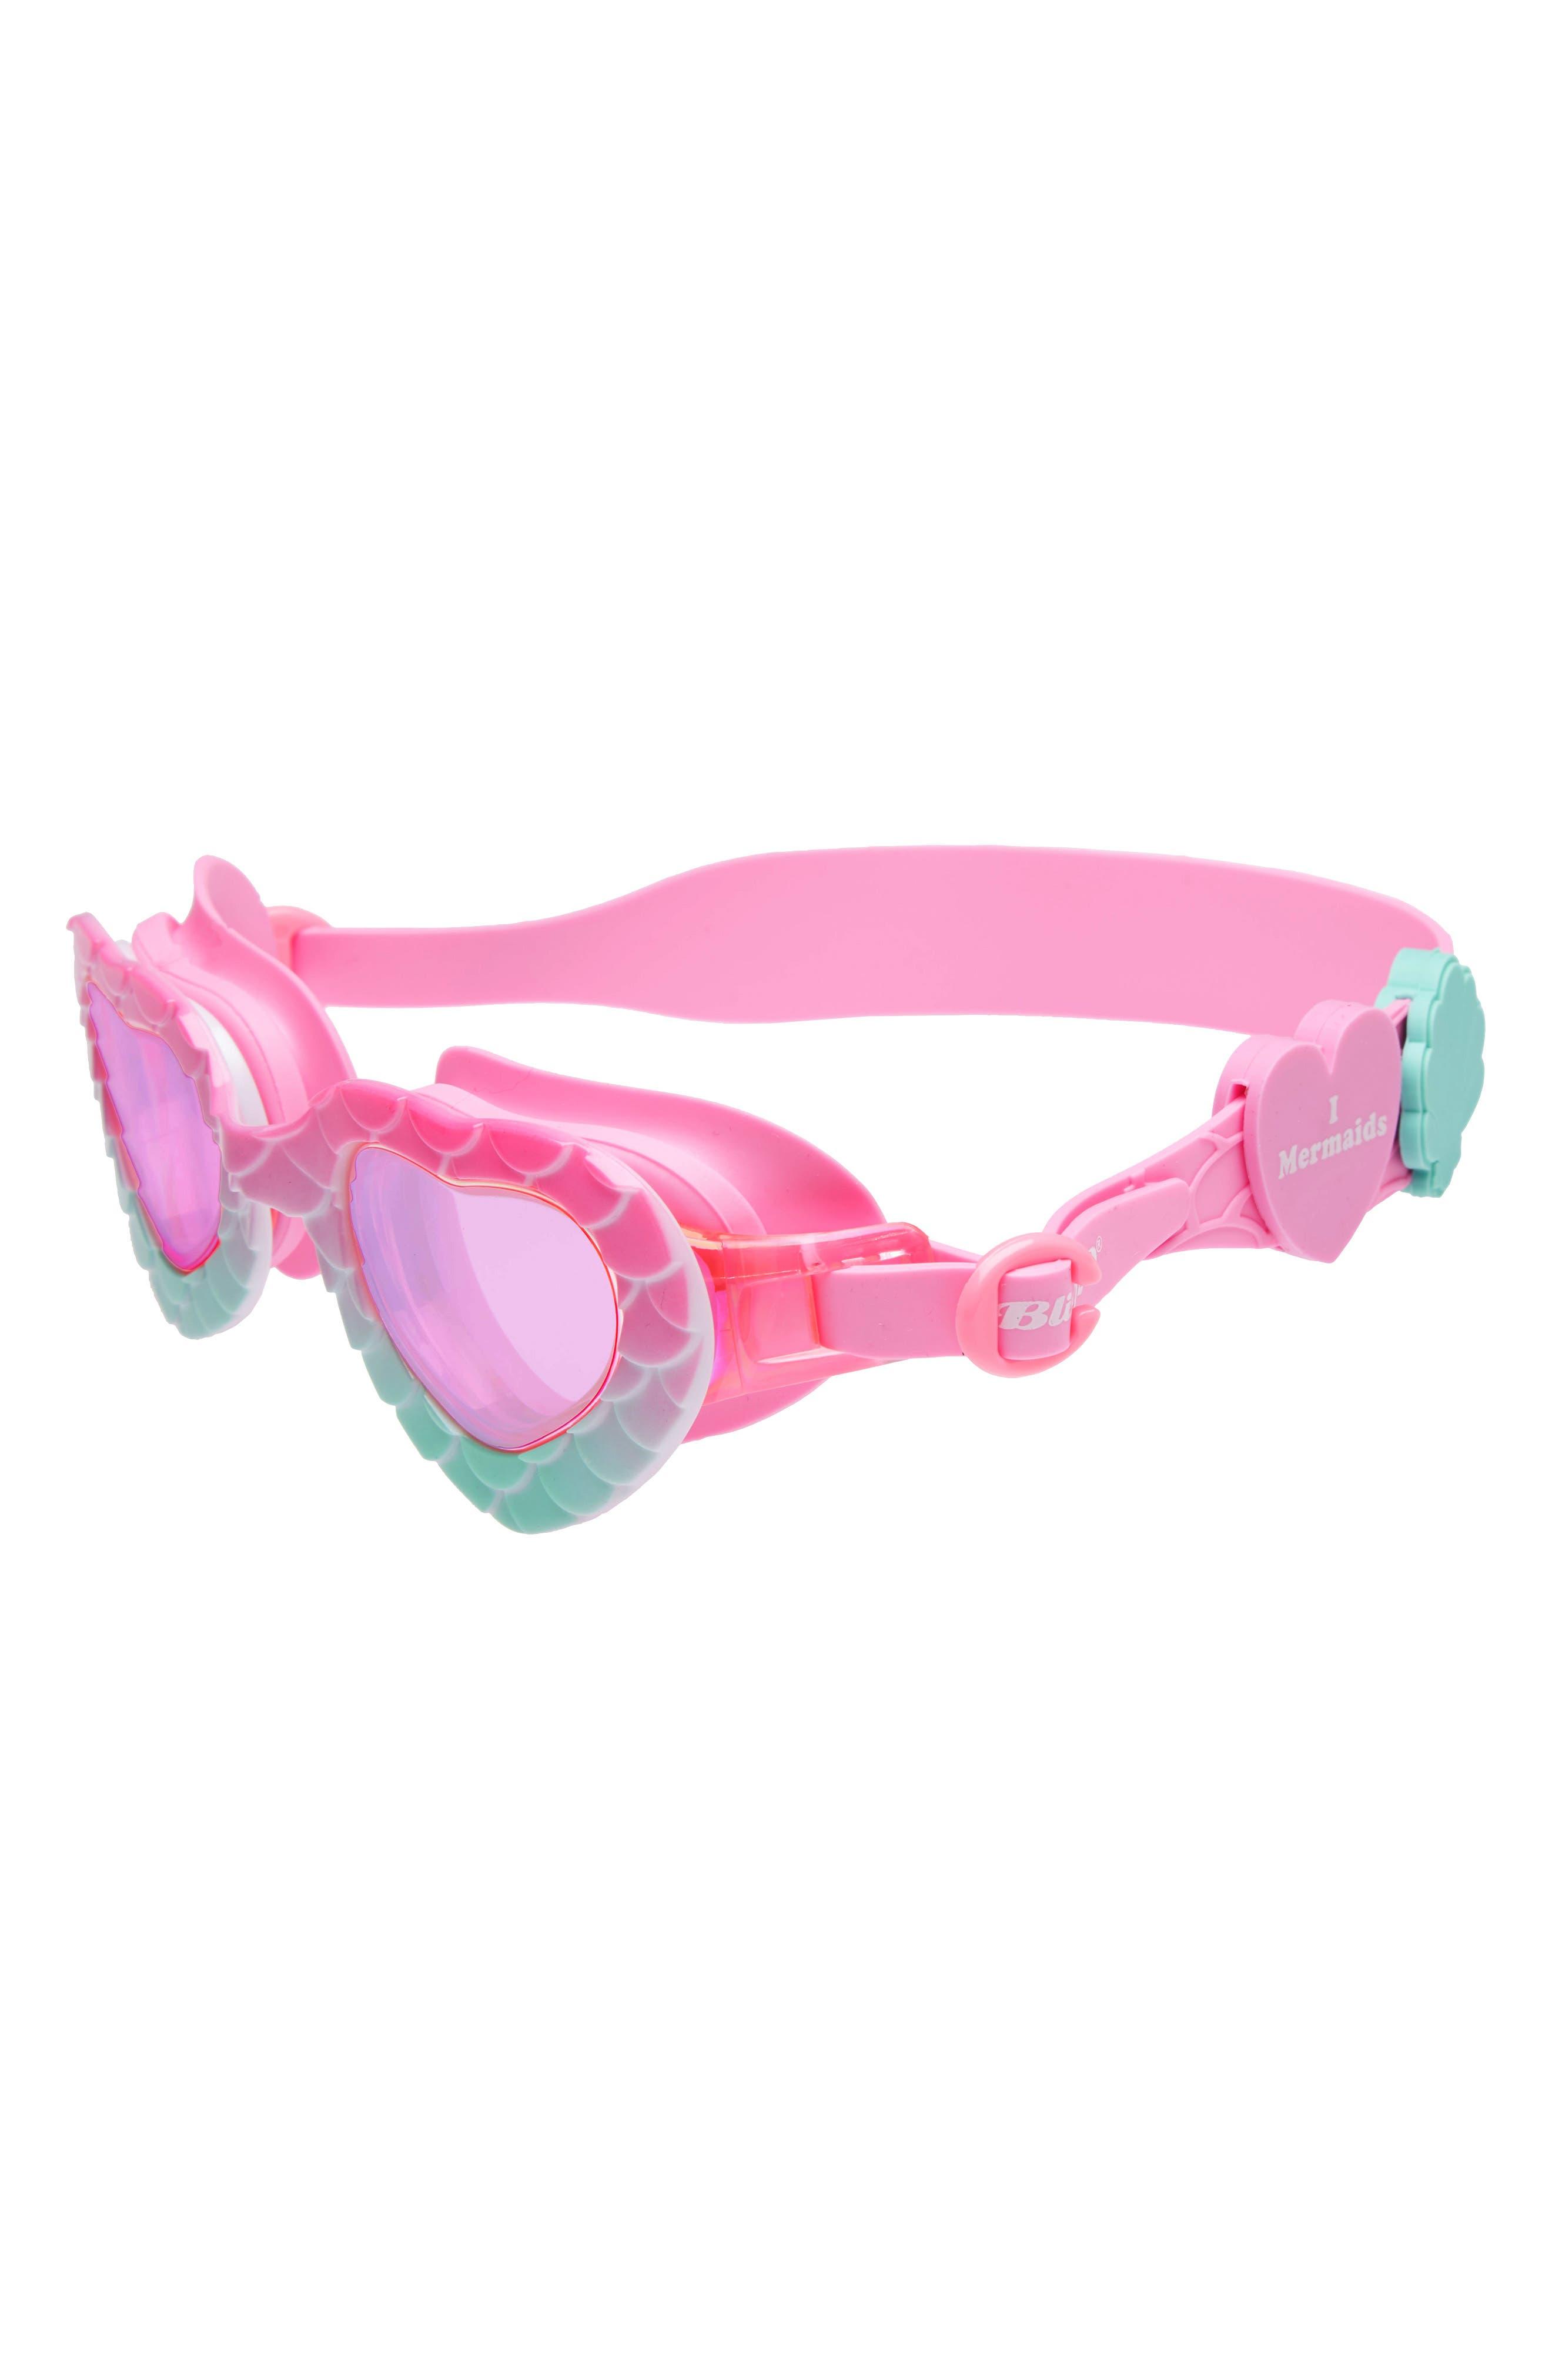 I Love Mermaids Swim Goggles,                             Main thumbnail 1, color,                             300